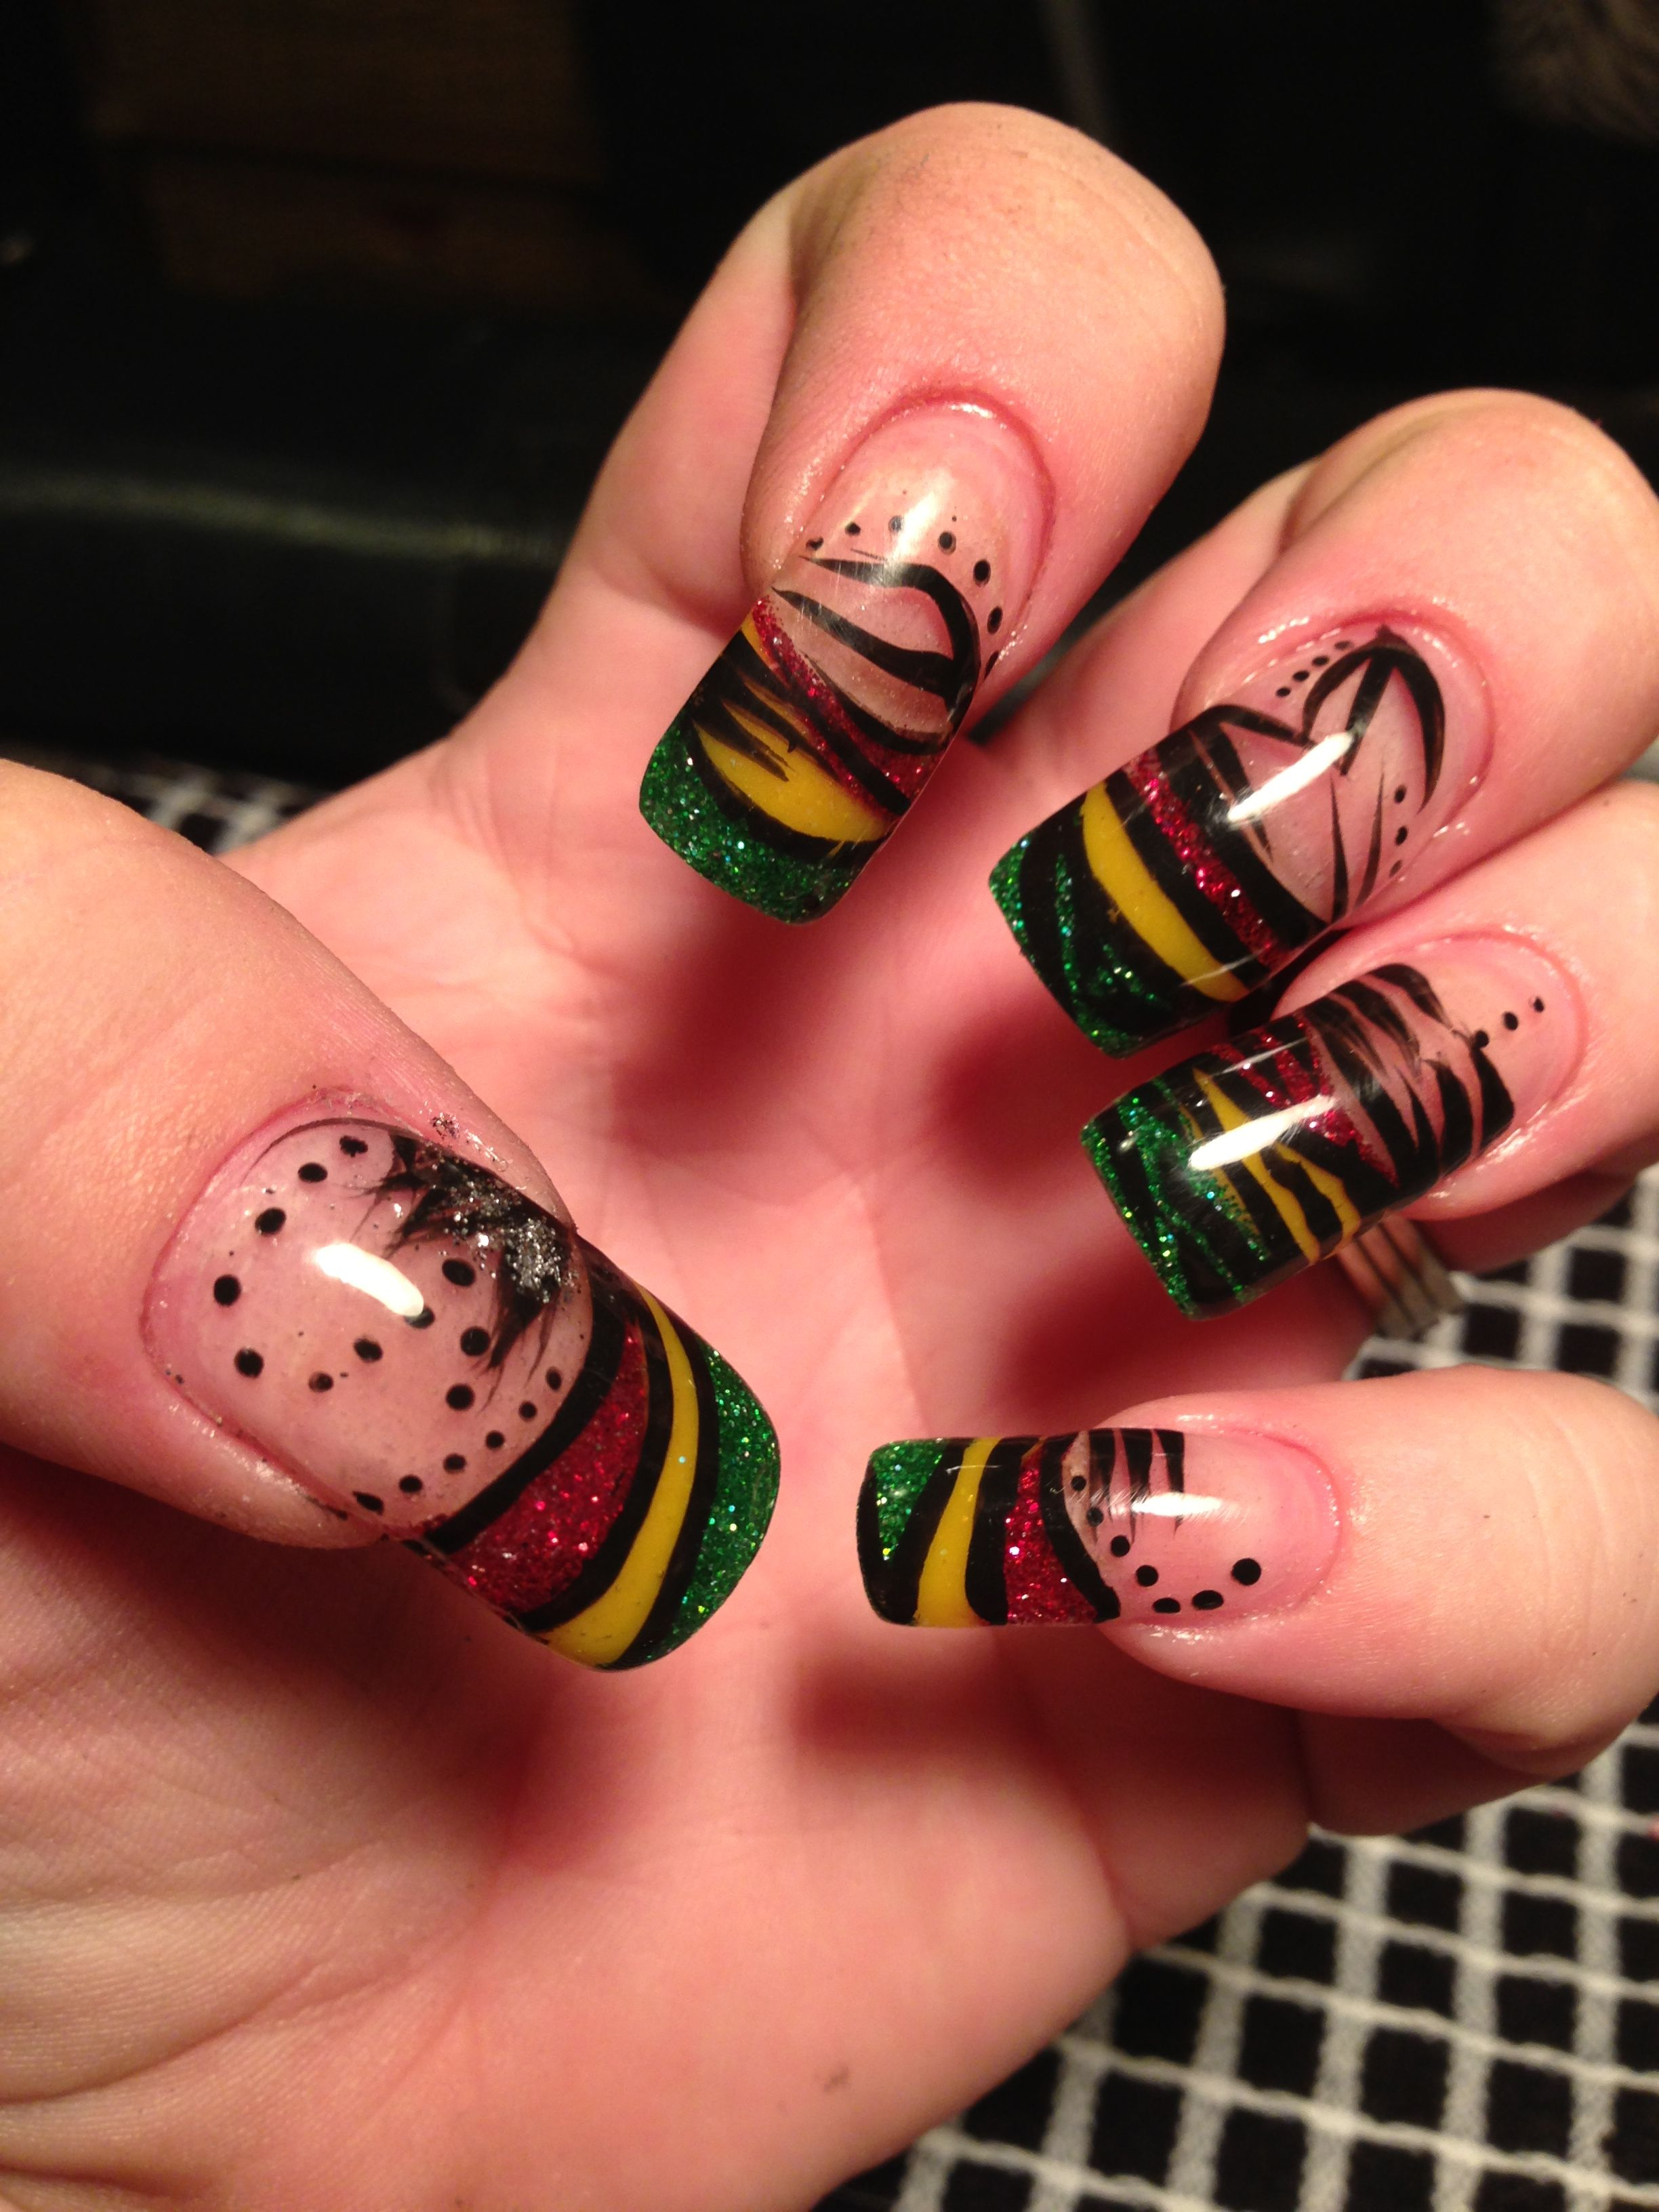 Rasta Nails Design : rasta, nails, design, Rasta, Nails, Ideas, Nails,, Jamaica